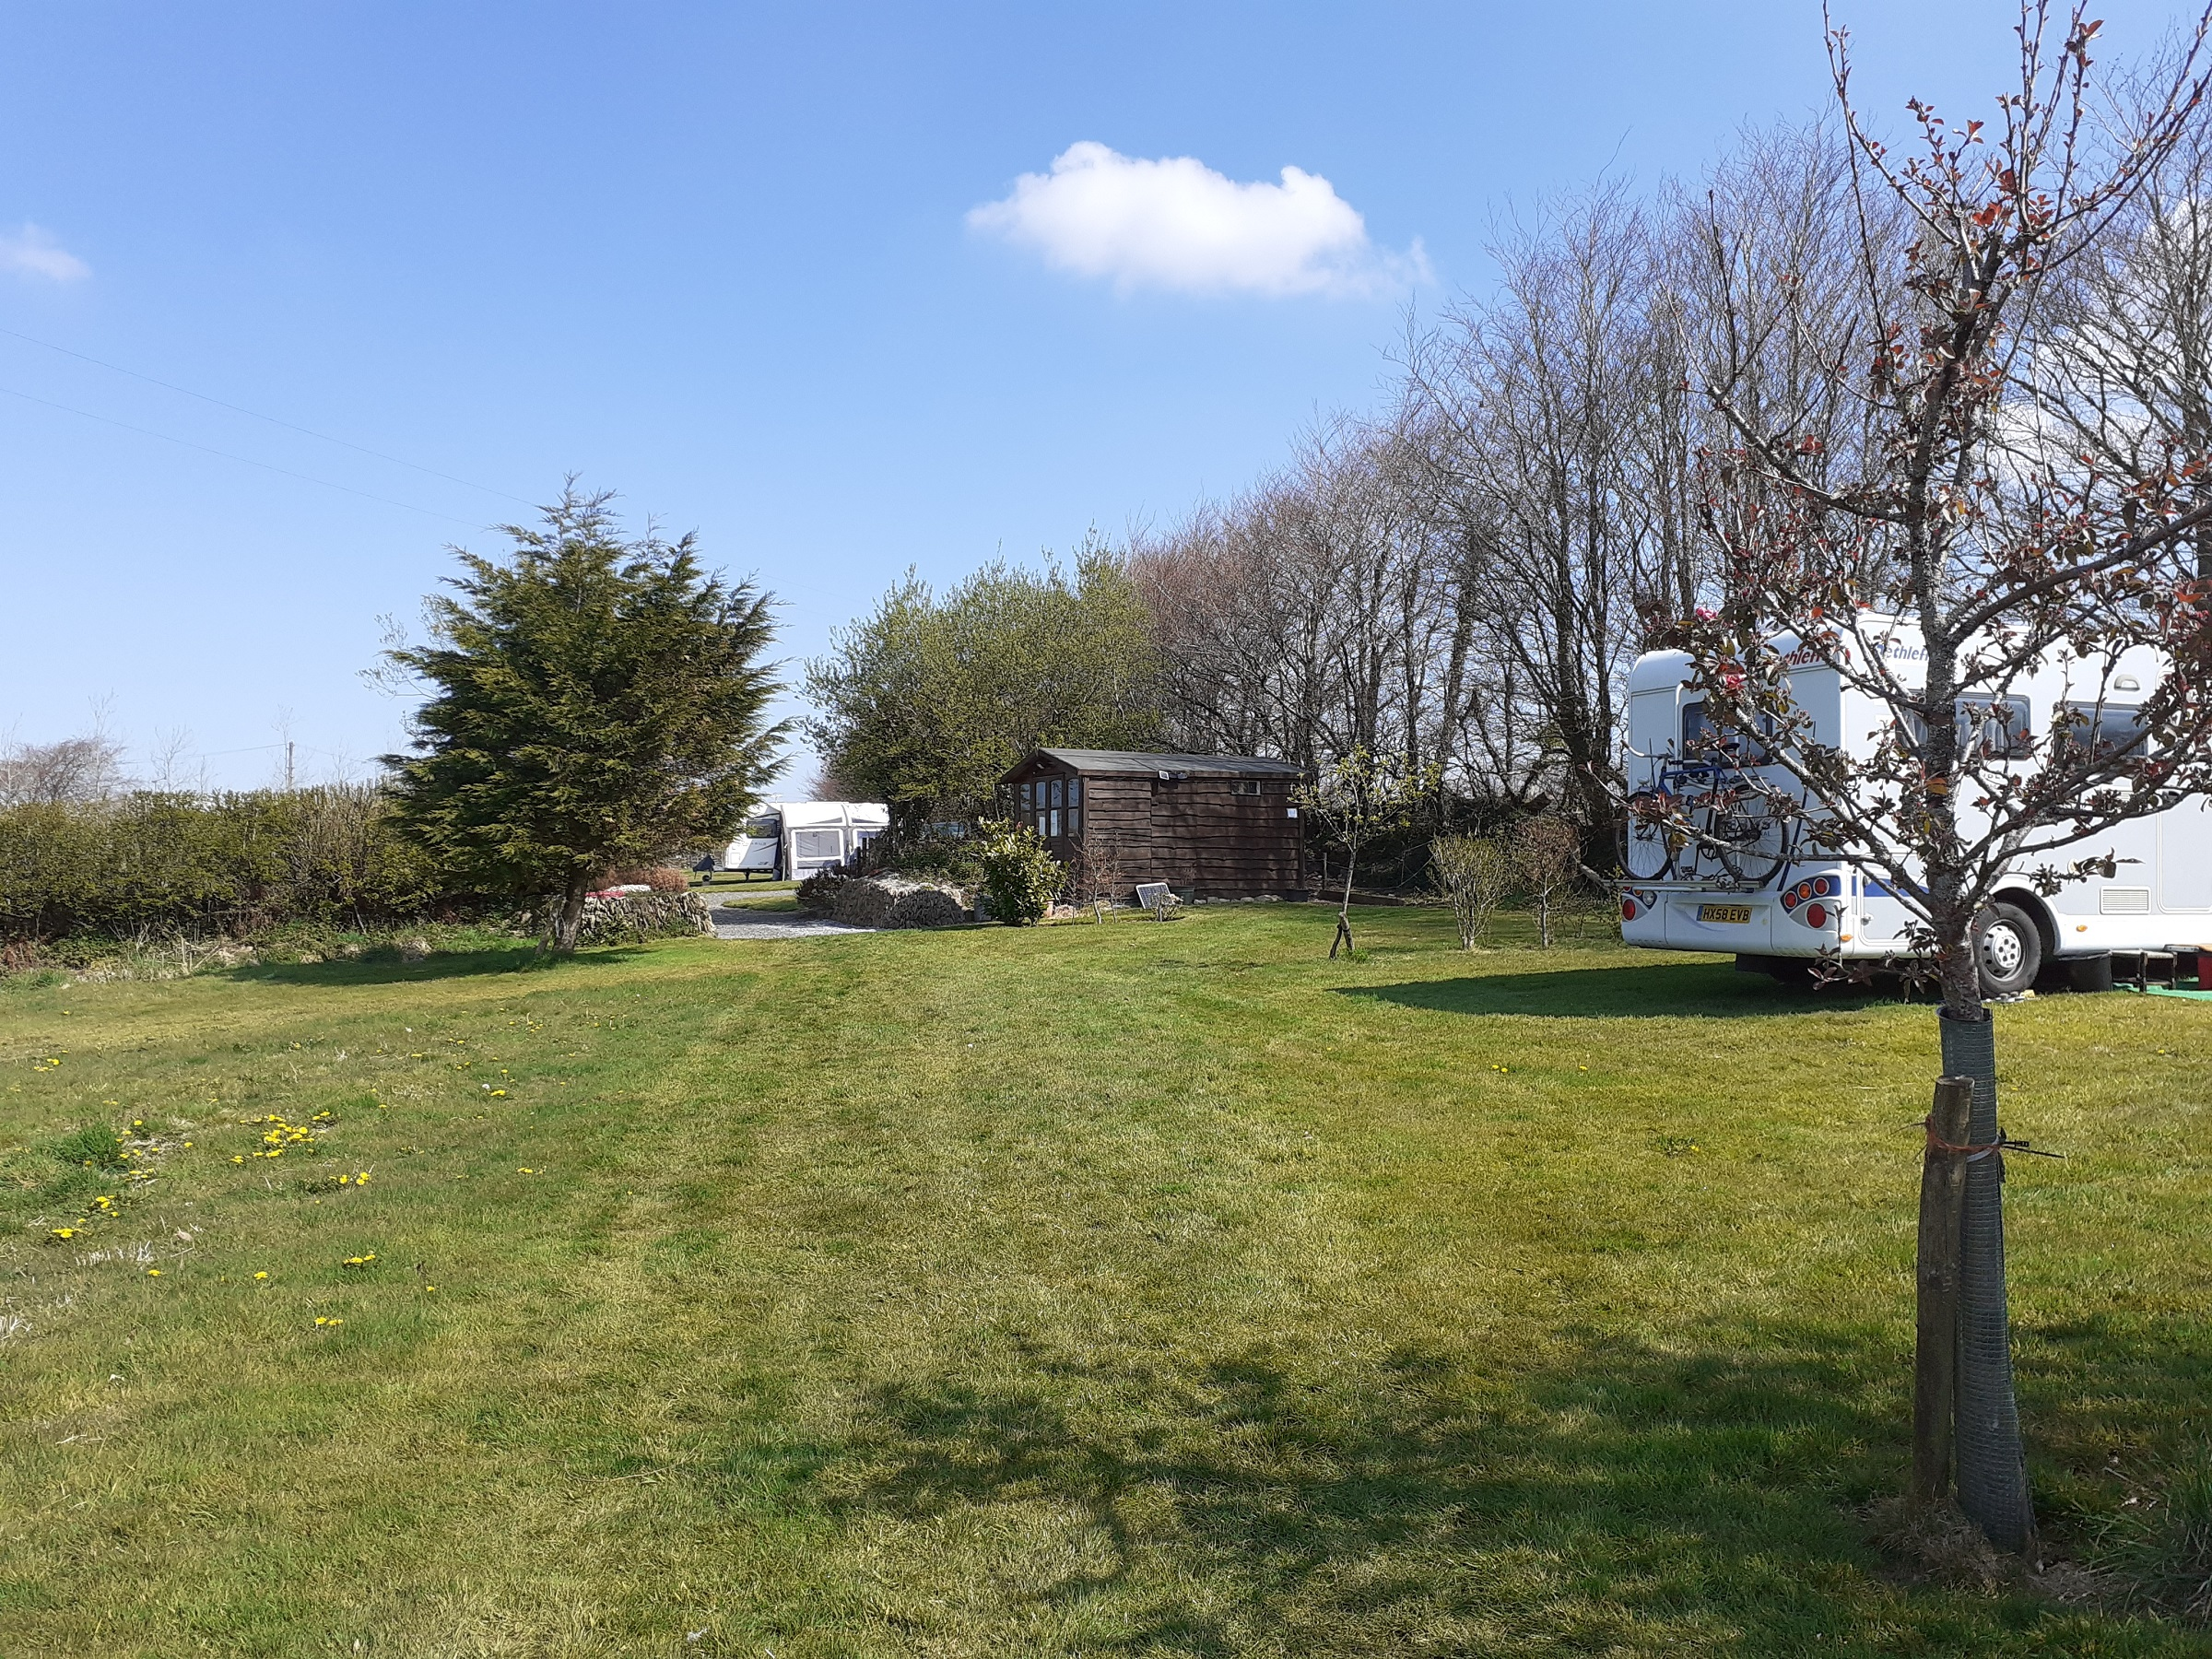 Grass pitch 7 facing west